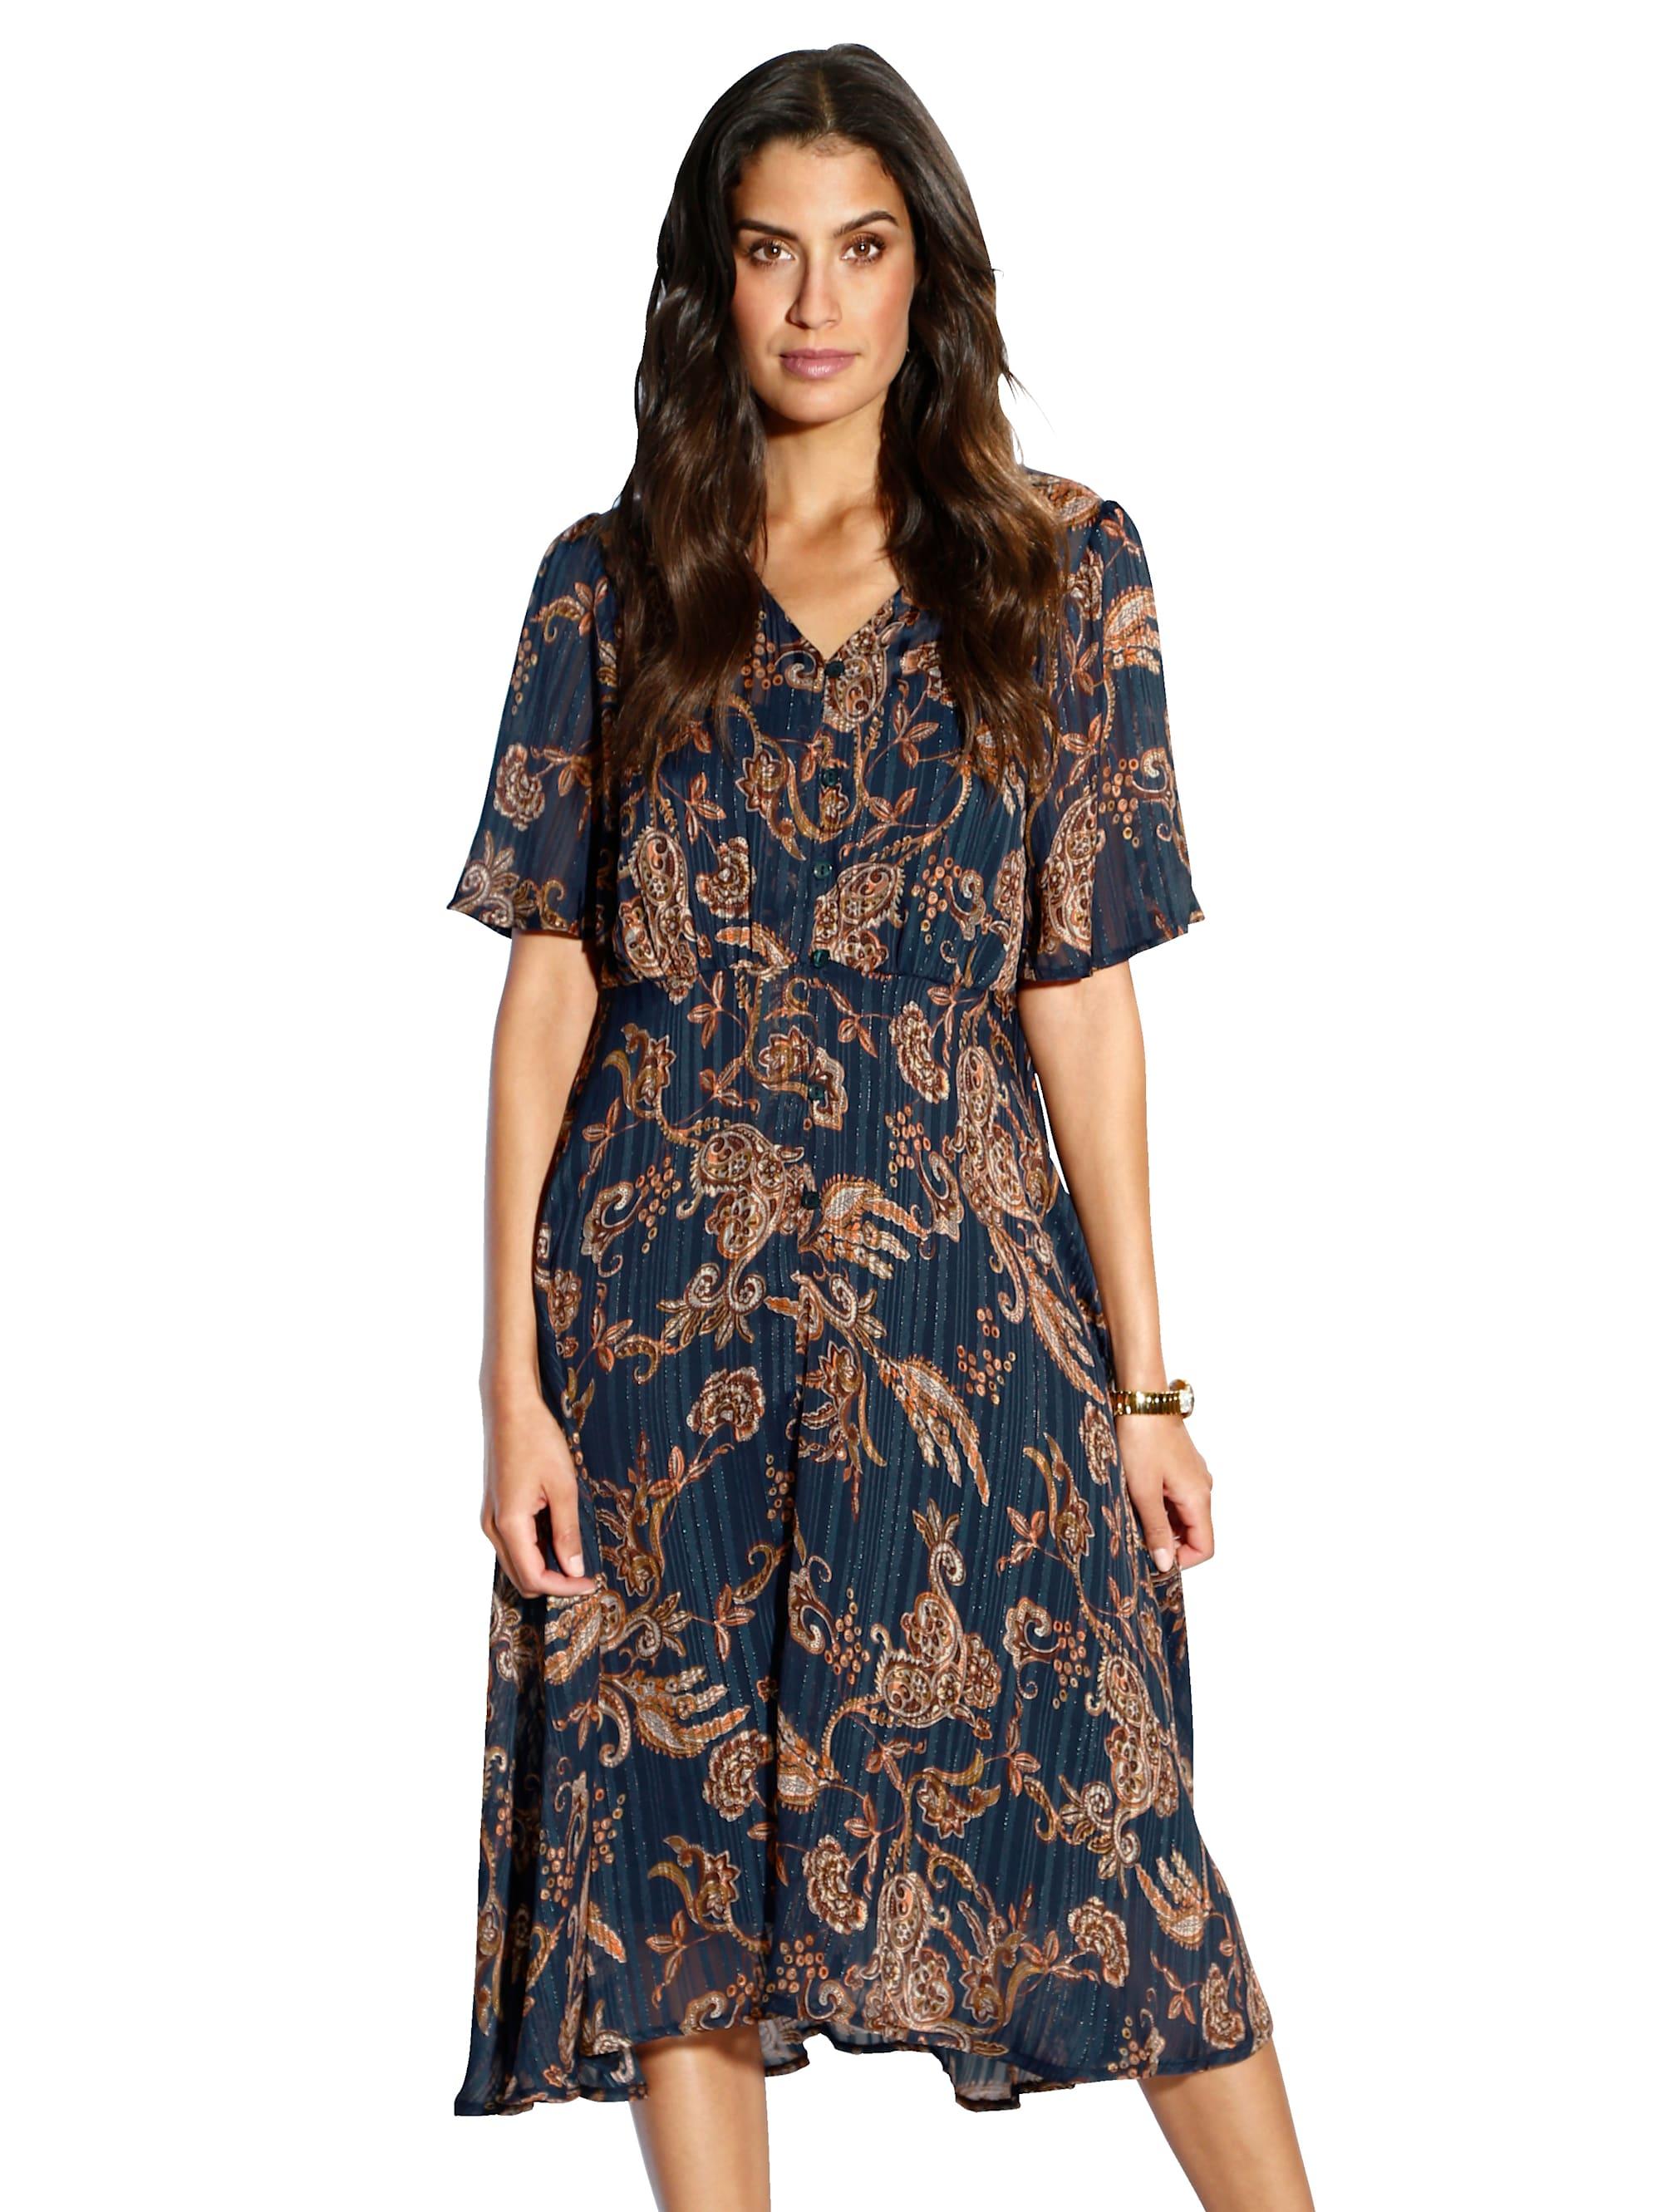 AMY VERMONT Kleid mit Paisley-Muster PEh4X TzQx5